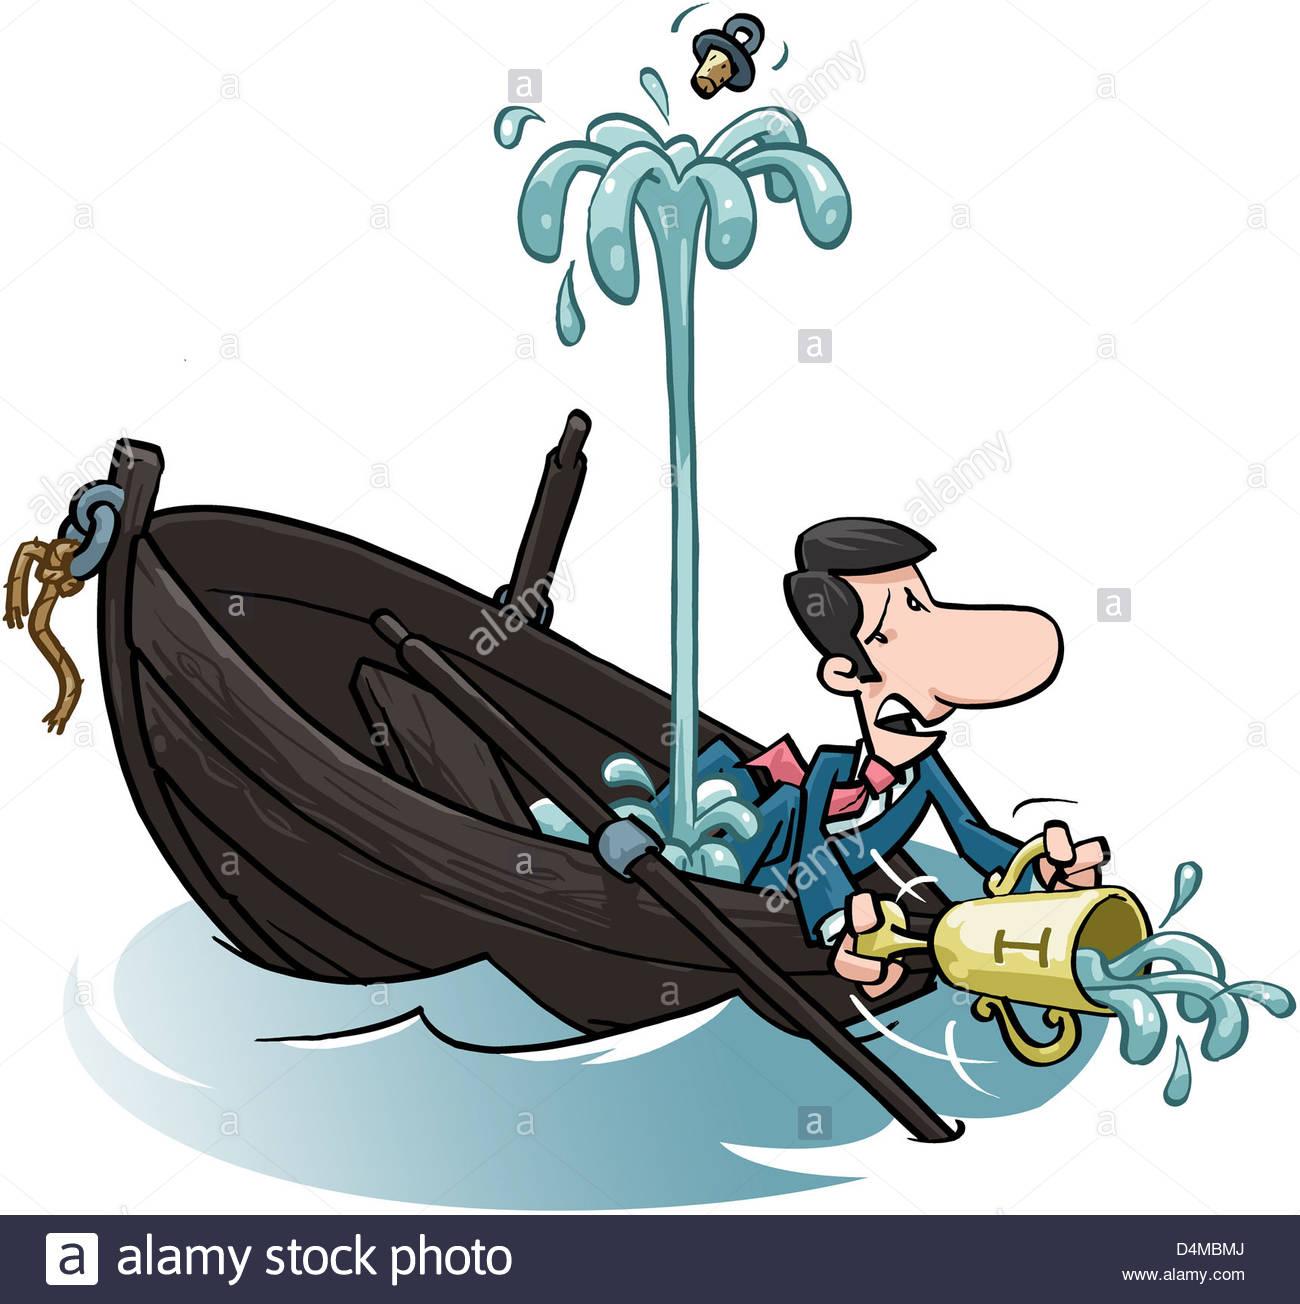 Illustration Boat Sinking Stock Photos & Illustration Boat Sinking.